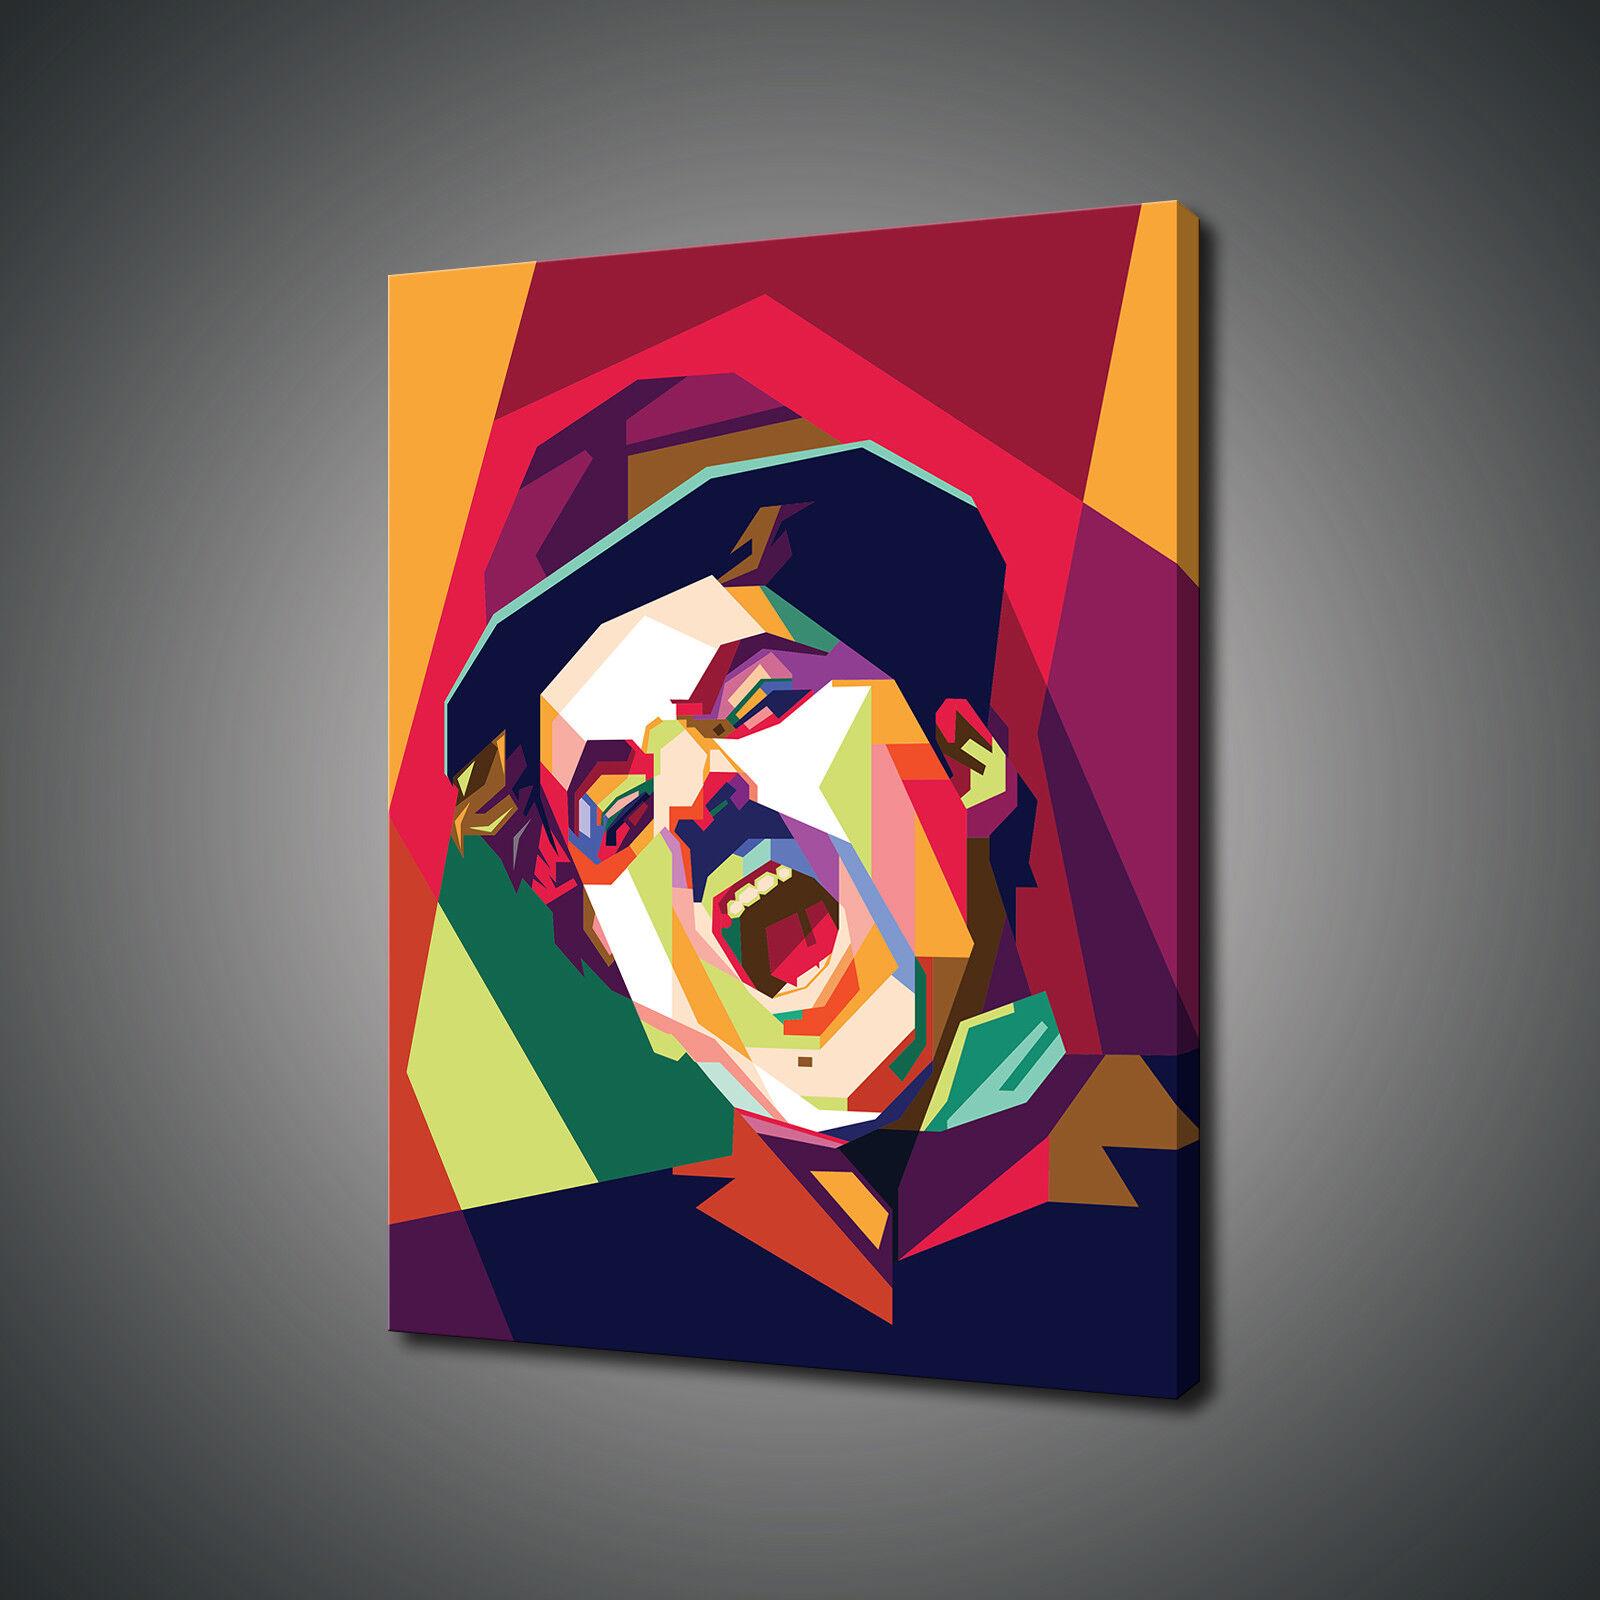 Charlie Chaplin pop art canvas print PICTURE Wall Art Gratuito UK Consegna